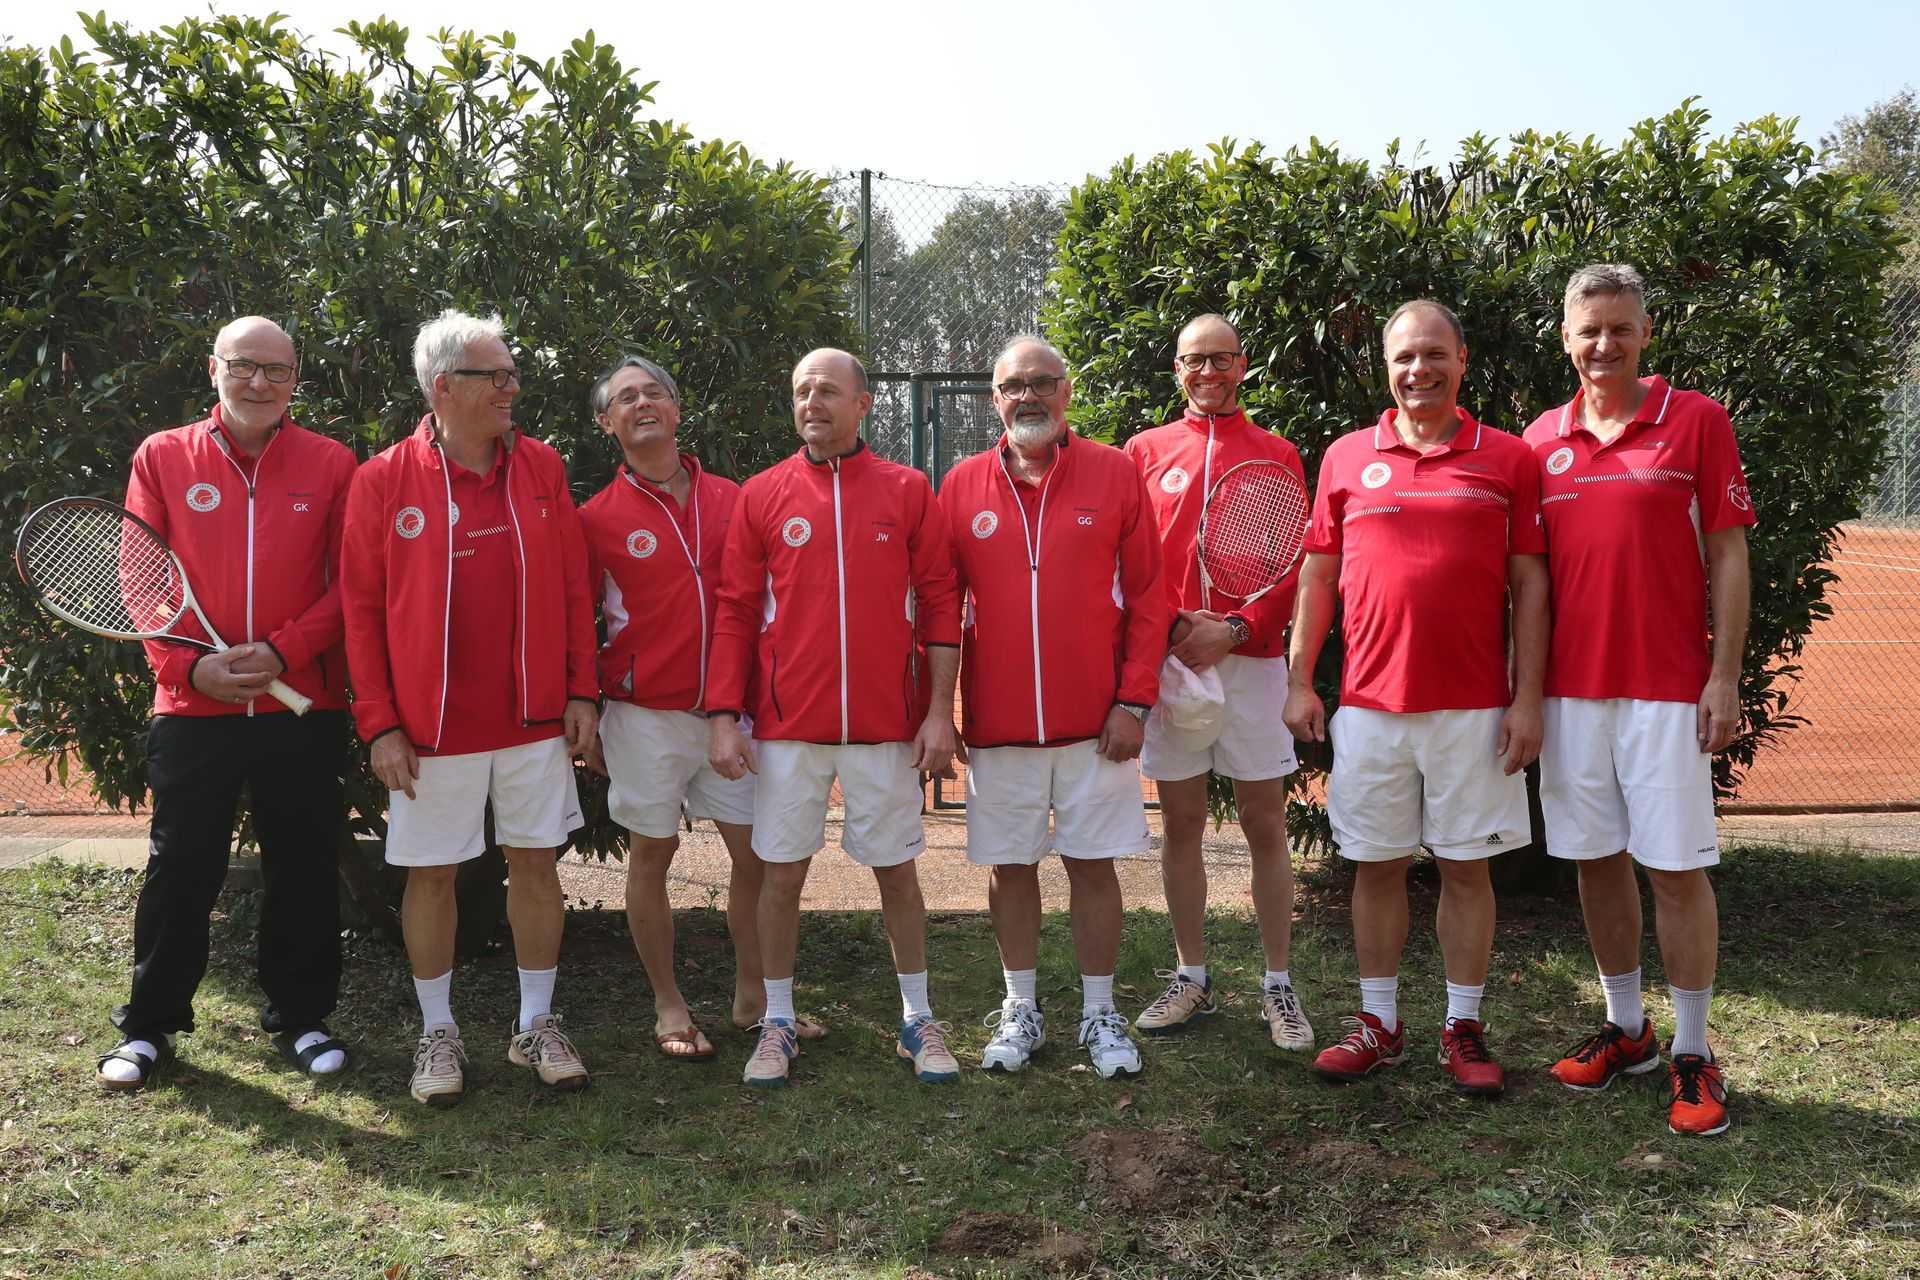 Tennisverein Kenzingen manschafte 16